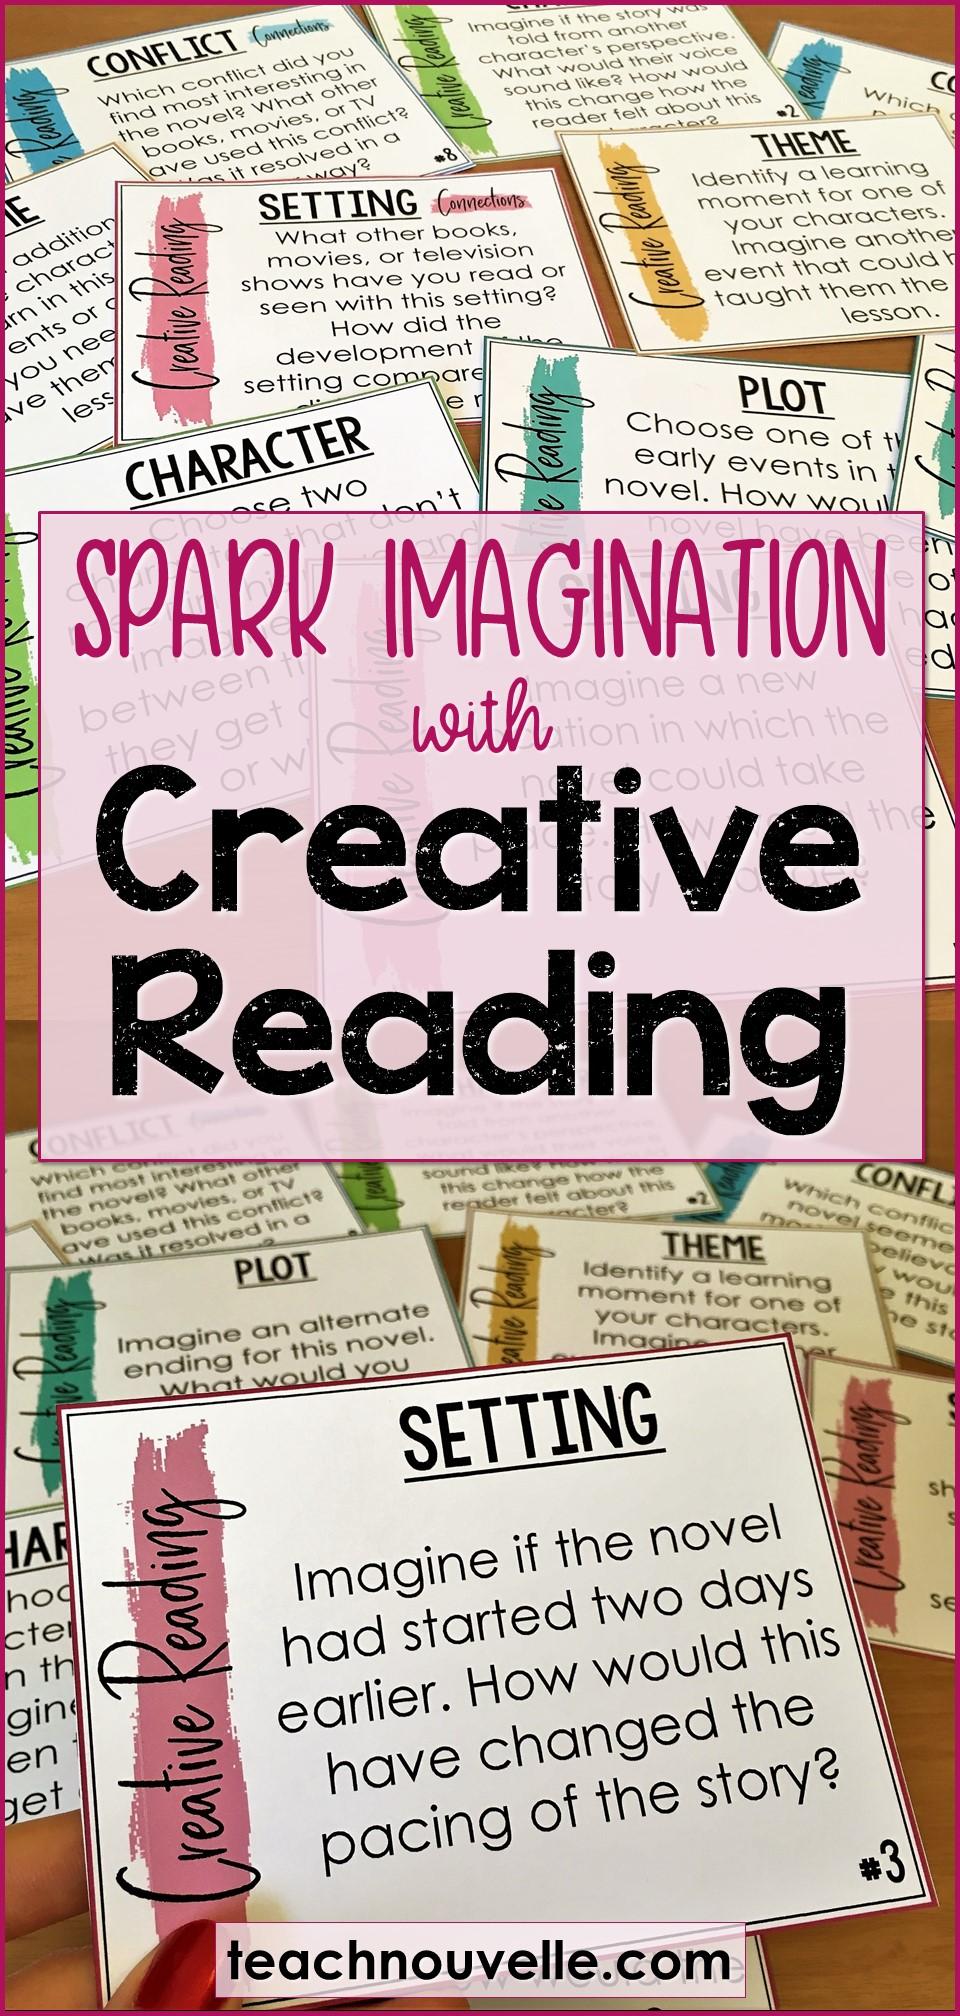 Creative Reading pin